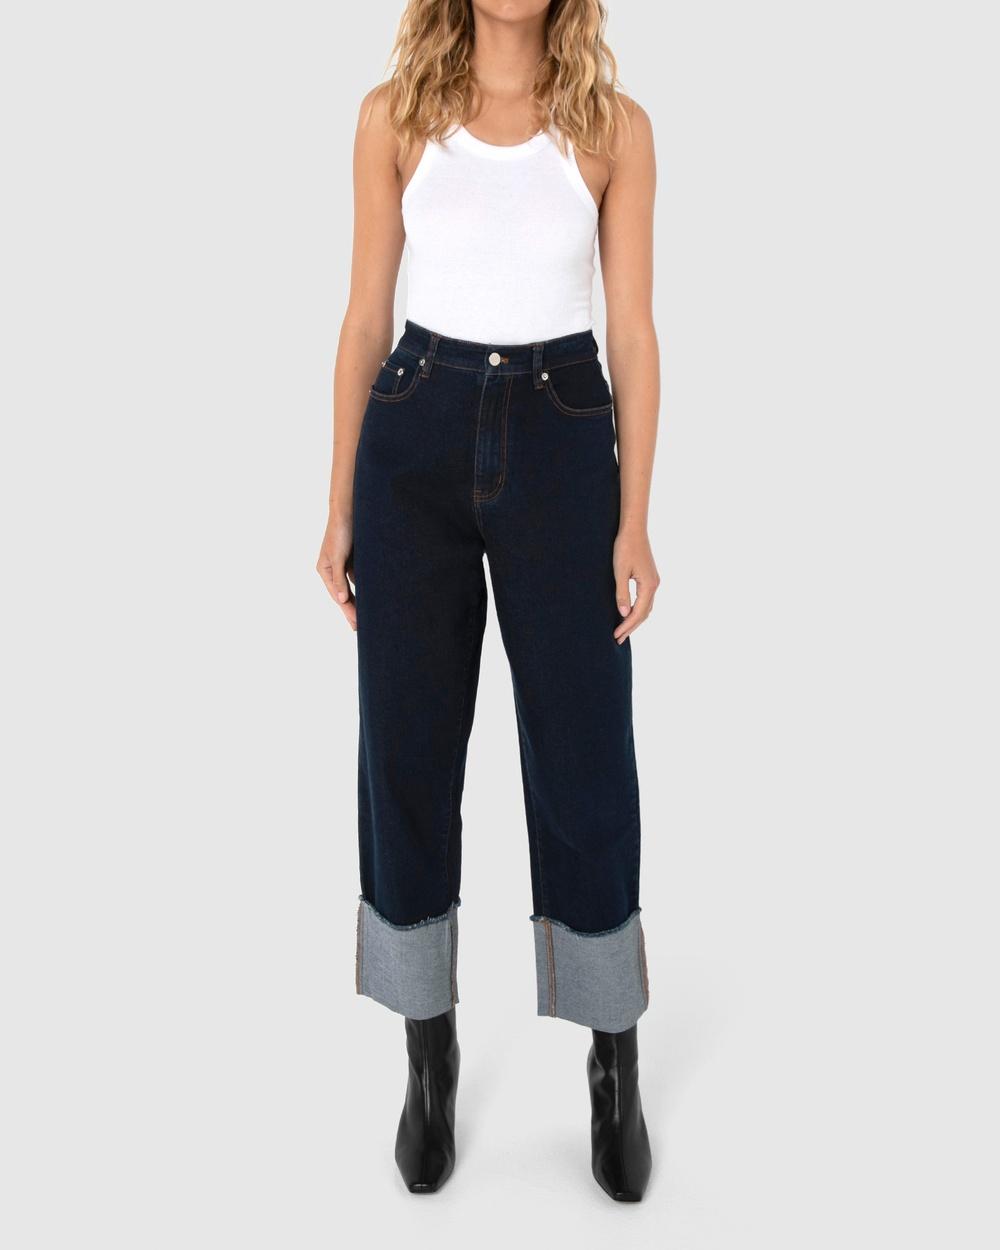 Madison The Label Harris Jeans High-Waisted Denim Australia